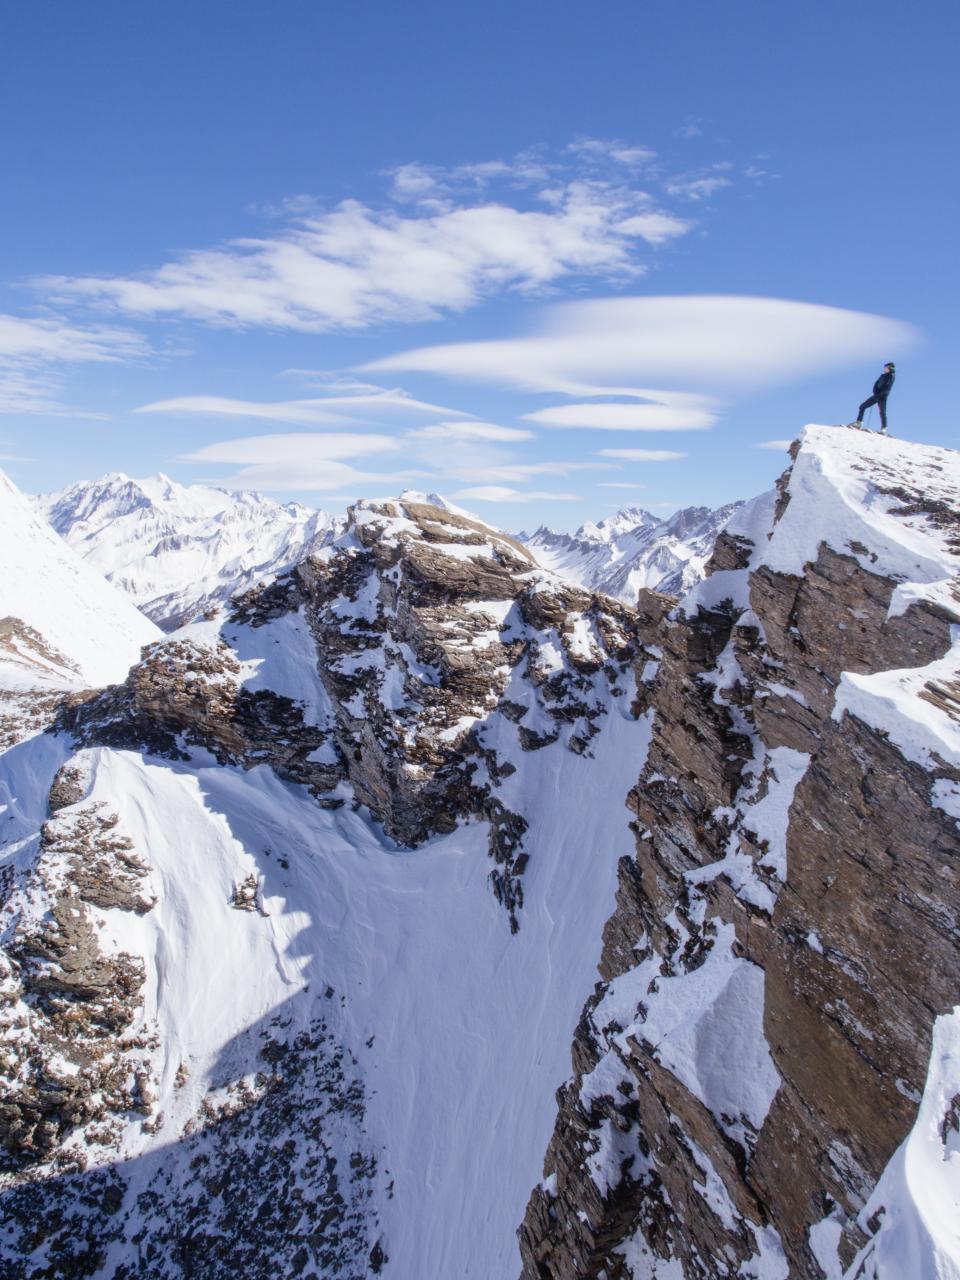 mountain highland landscape nature snow winter peak summit ridge people woman climbing adventure travel sky cloud